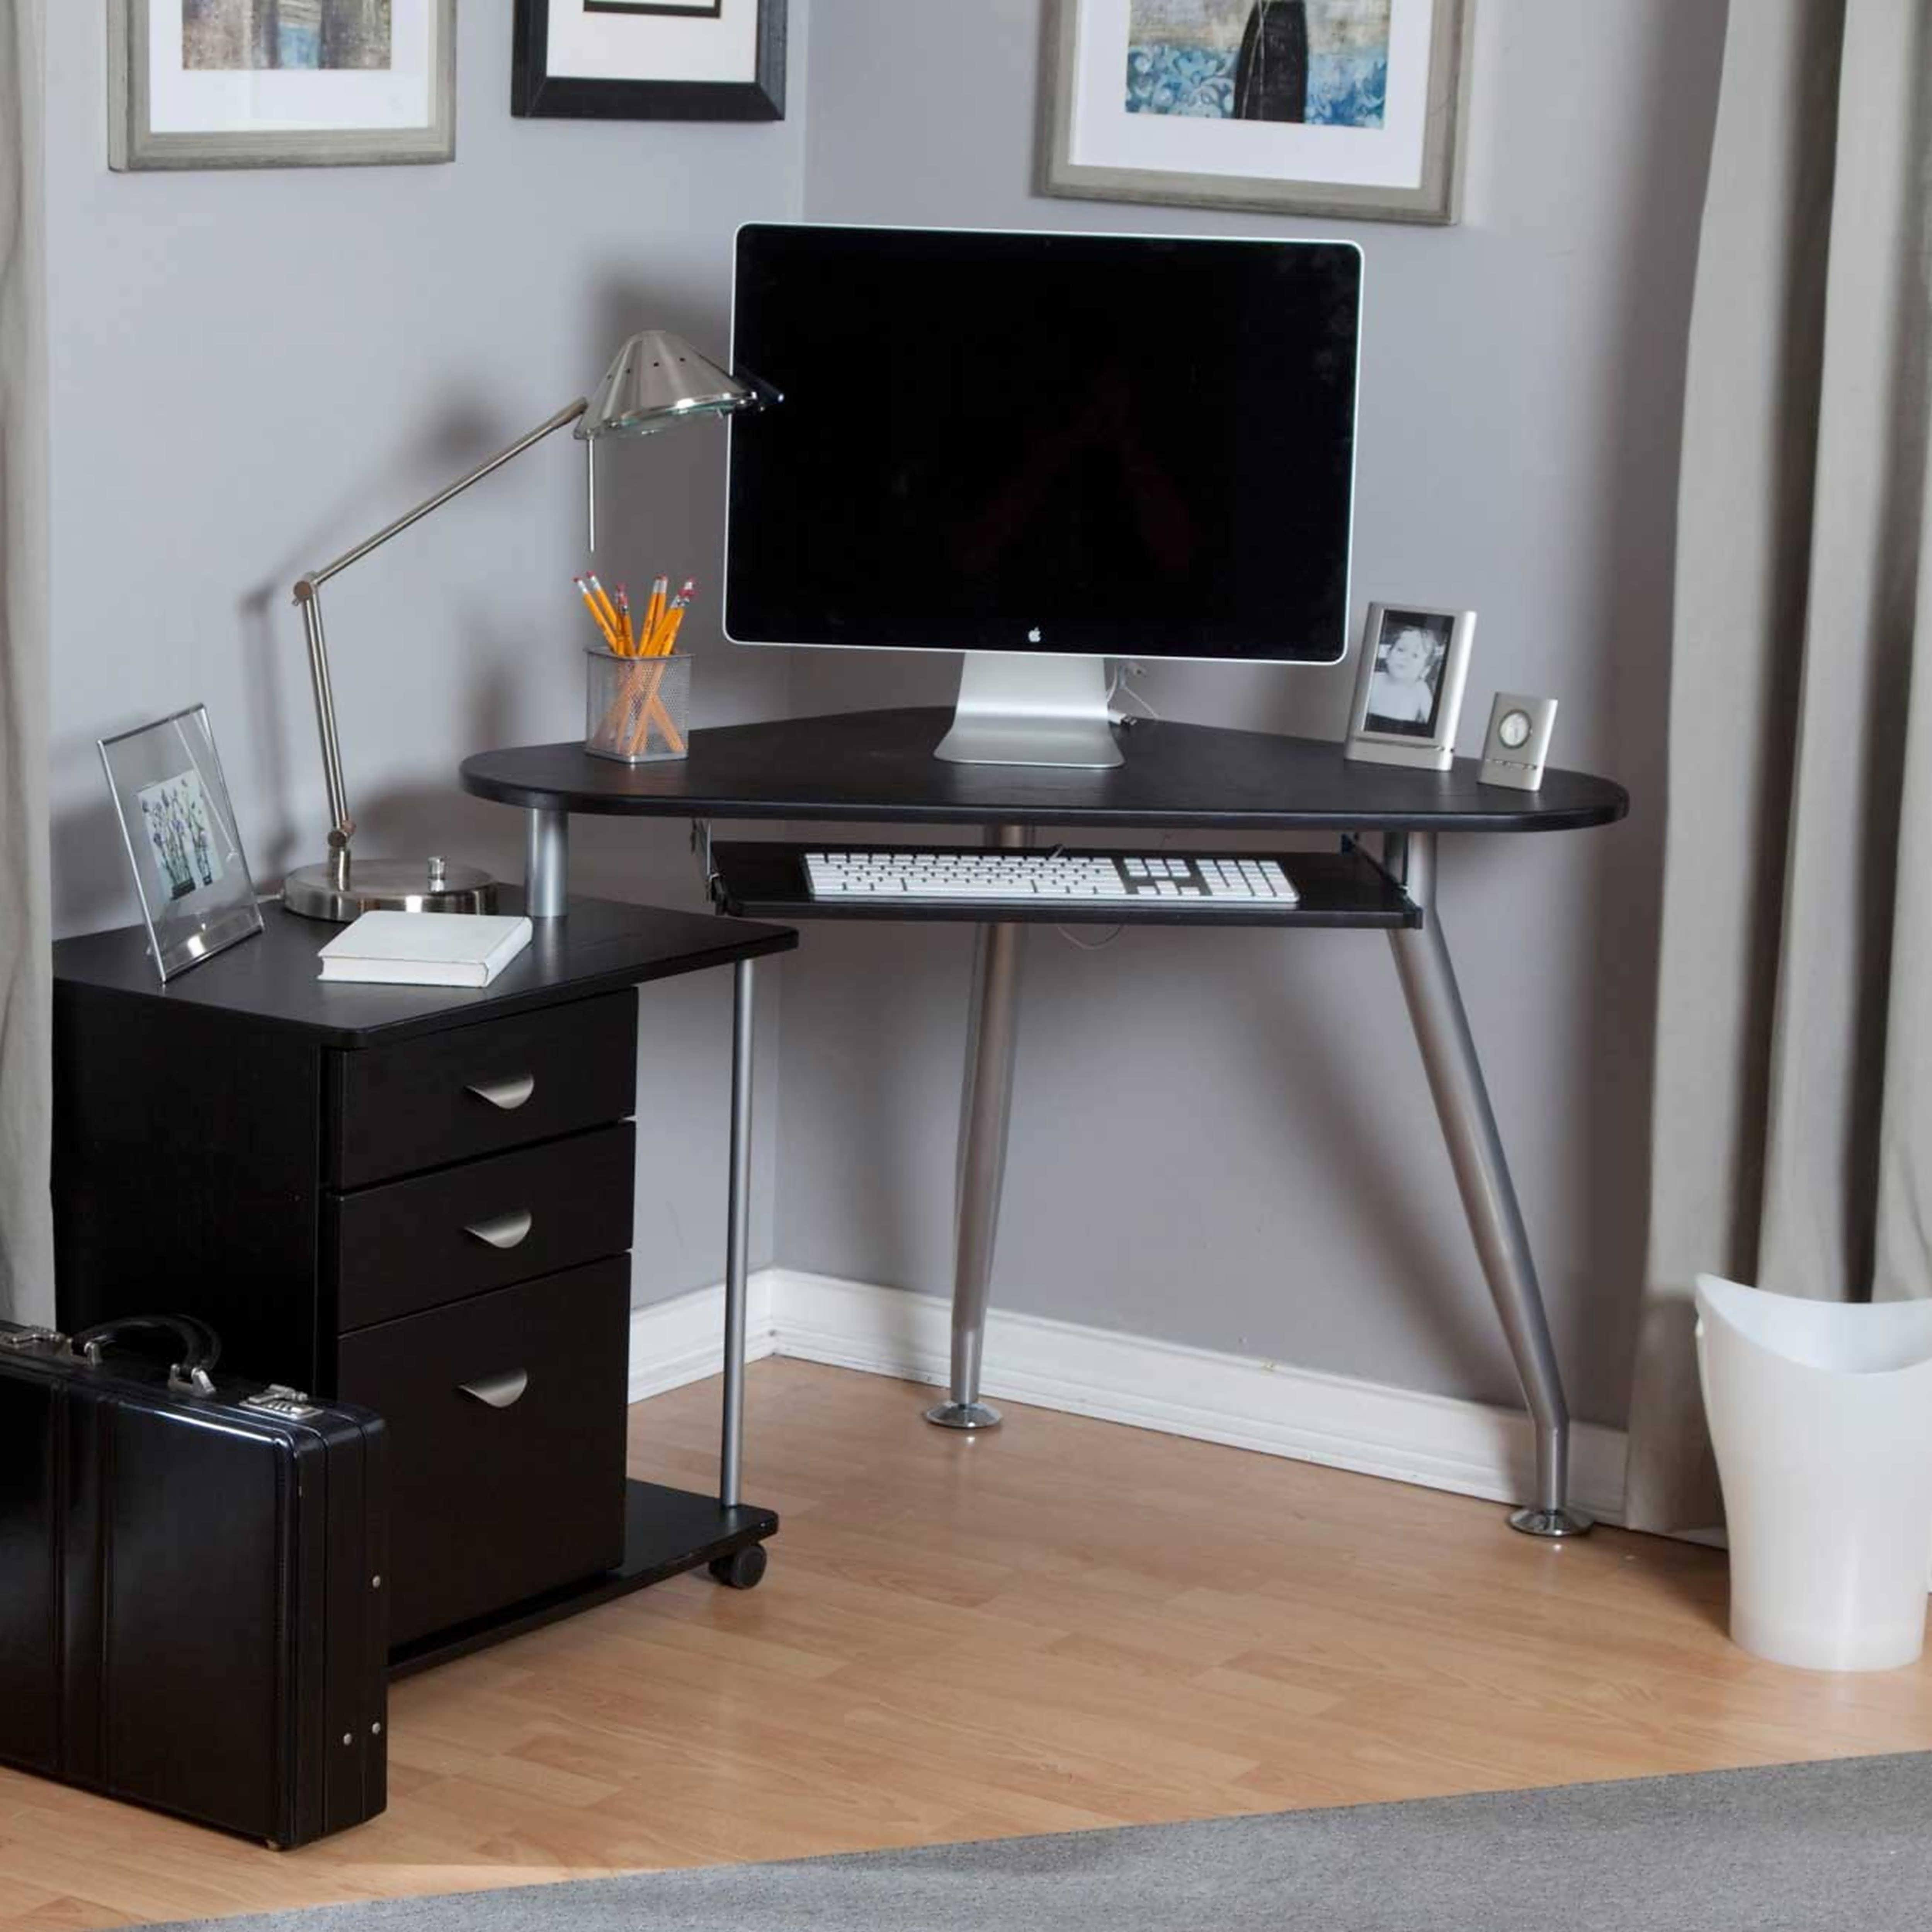 Computer Desks For Small Areas Regarding Most Recent Office Desk : Cheap Desk Corner Desk Small Glass Computer Desk (View 20 of 20)